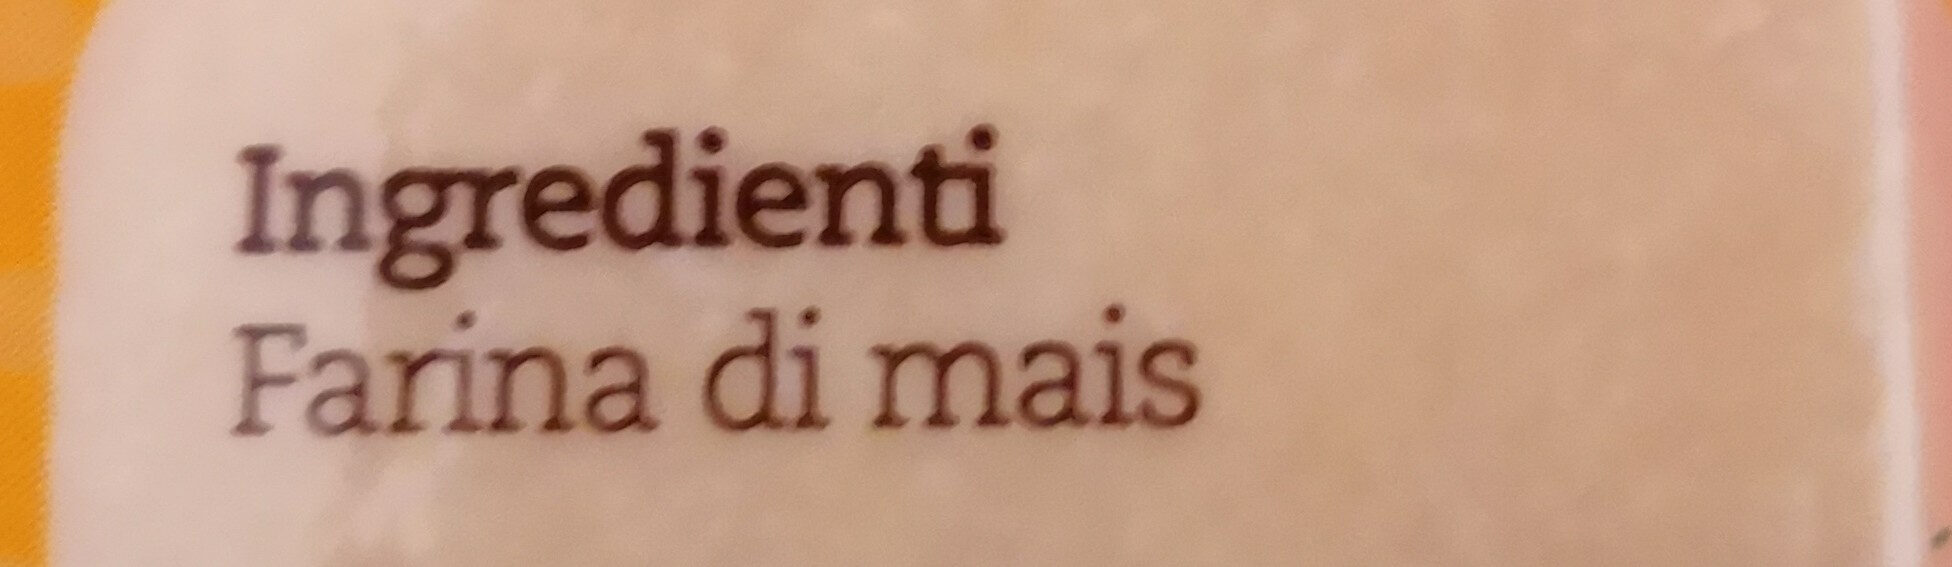 polenta bergamasca - Ingredients